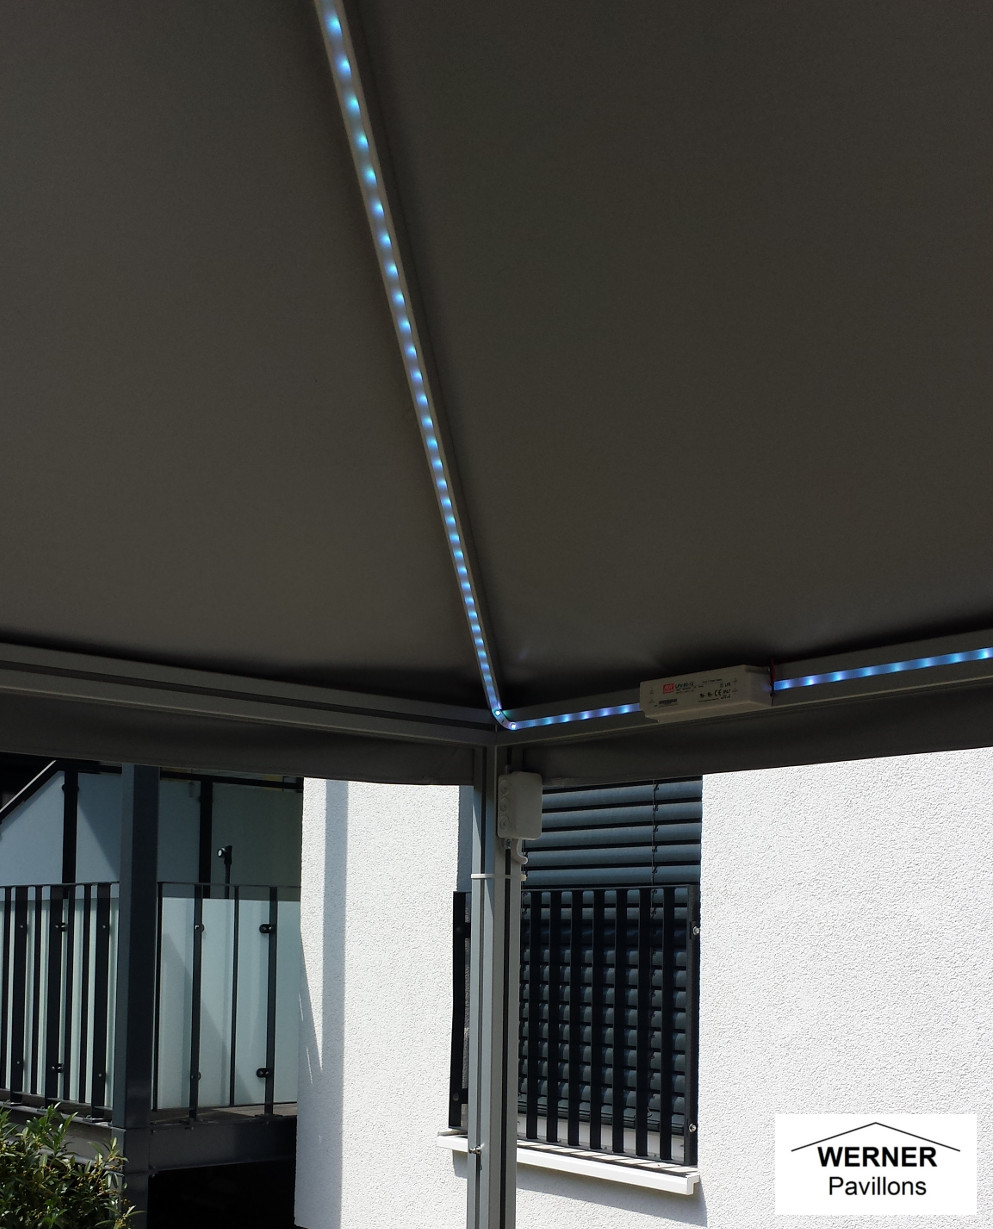 led beleuchtung der pavillon aus aluprofil mit 10 jahren garantie. Black Bedroom Furniture Sets. Home Design Ideas